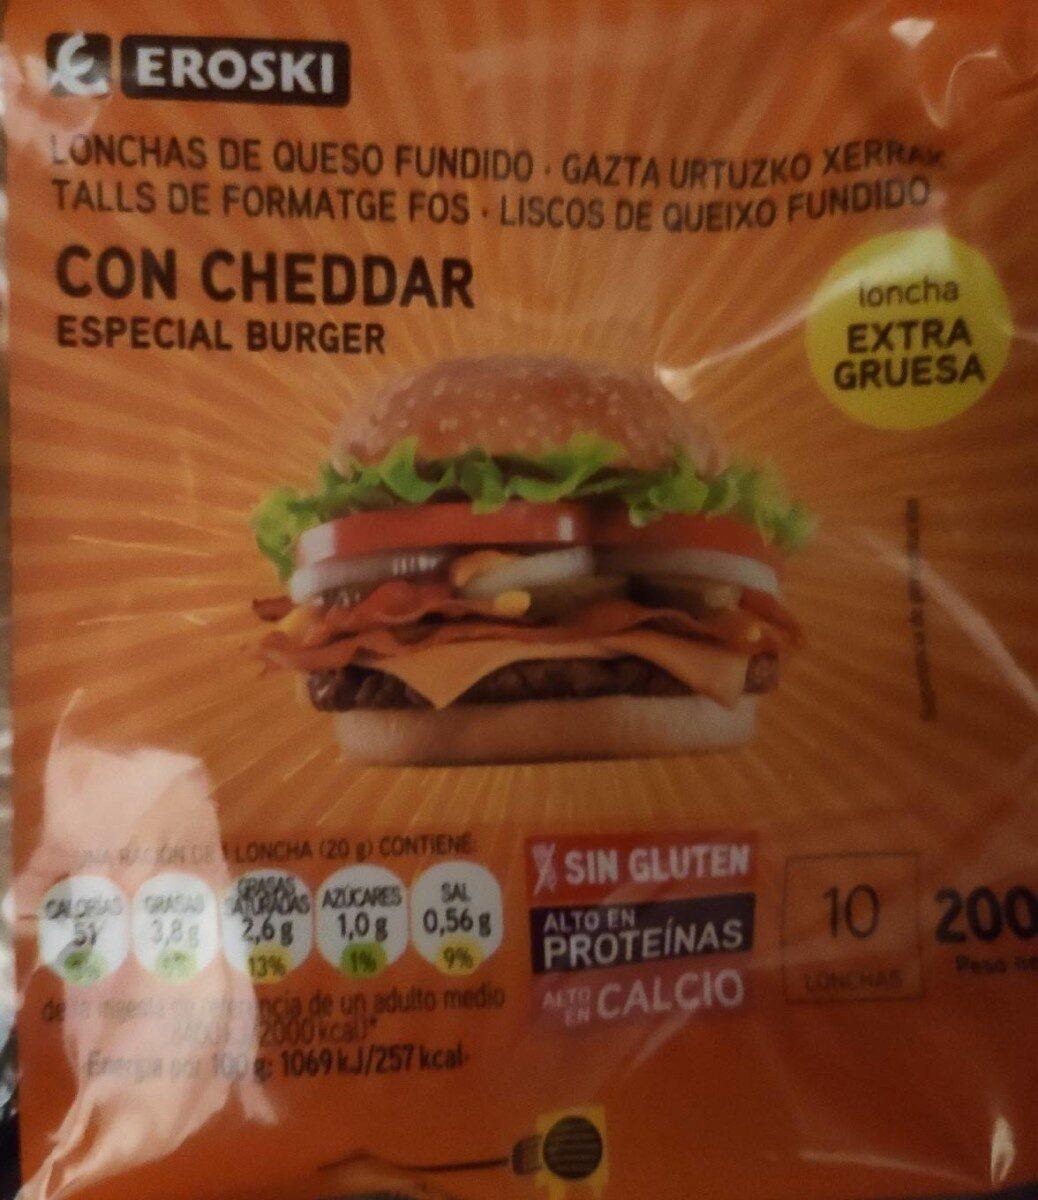 lonchas de queso cheddar - Product